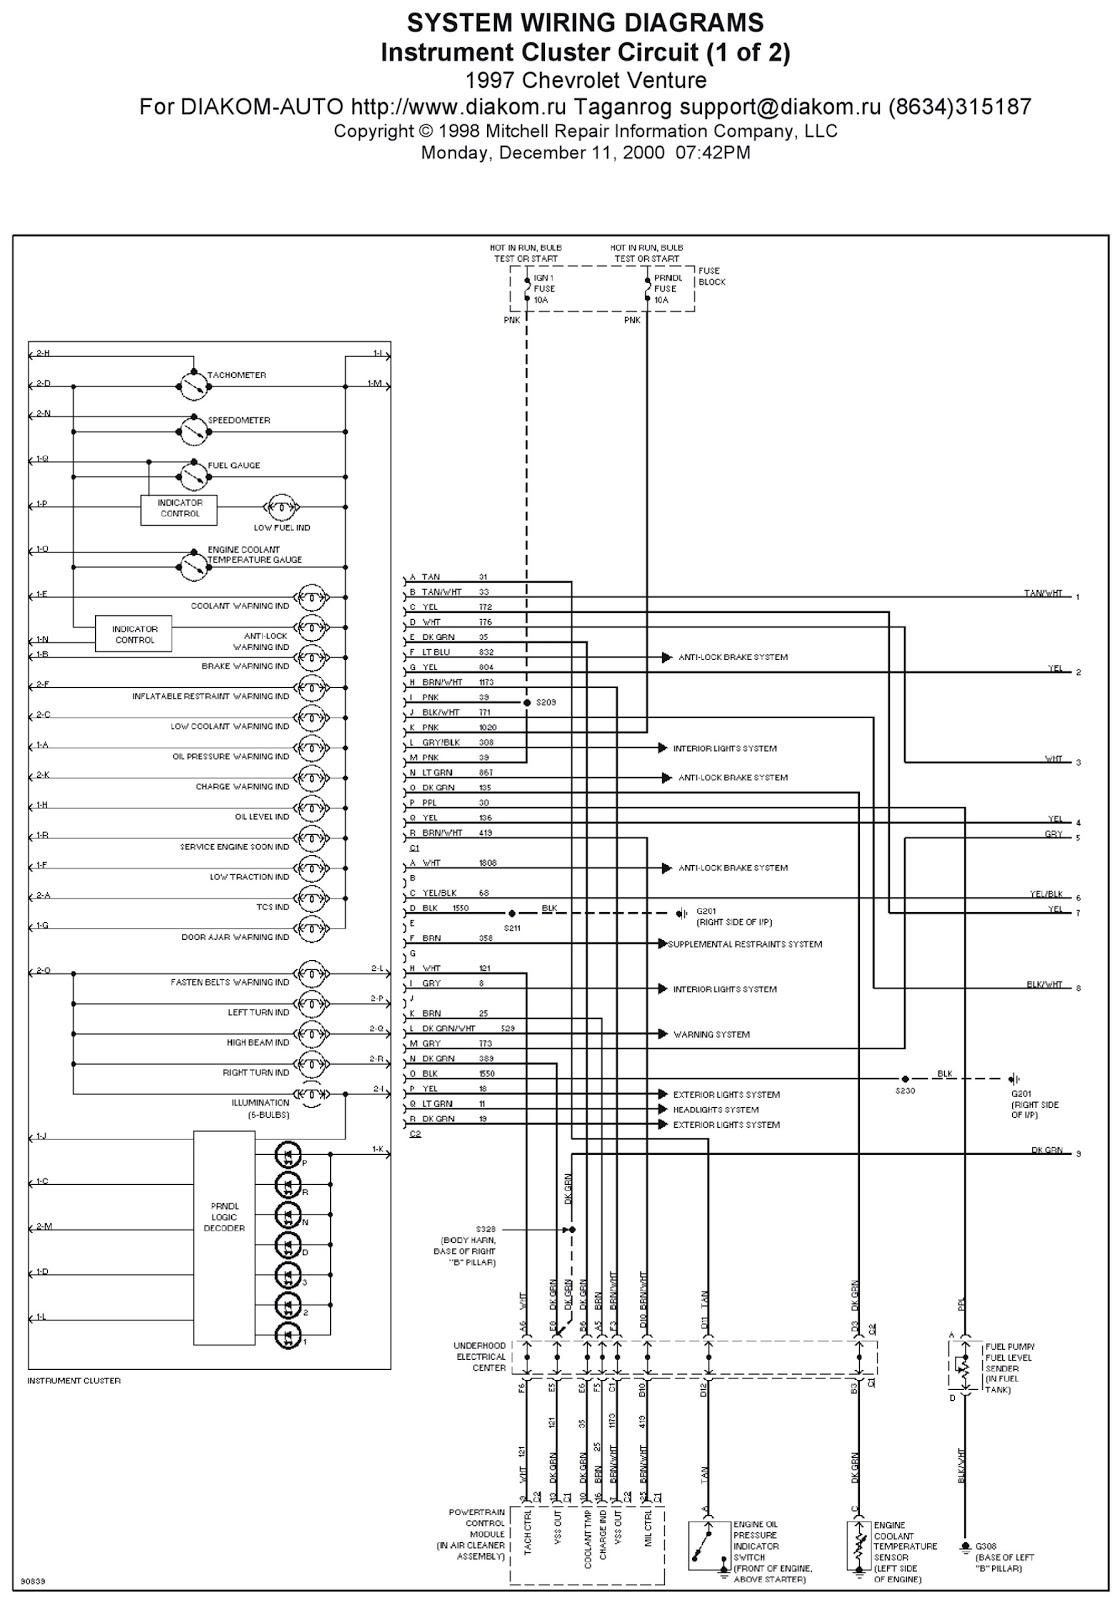 EM_3205] 2001 Chevy Venture Engine Diagram Download Diagram   Wiring Diagram For 1998 Chevy Venture      Funi Ospor Anth Dome Mohammedshrine Librar Wiring 101